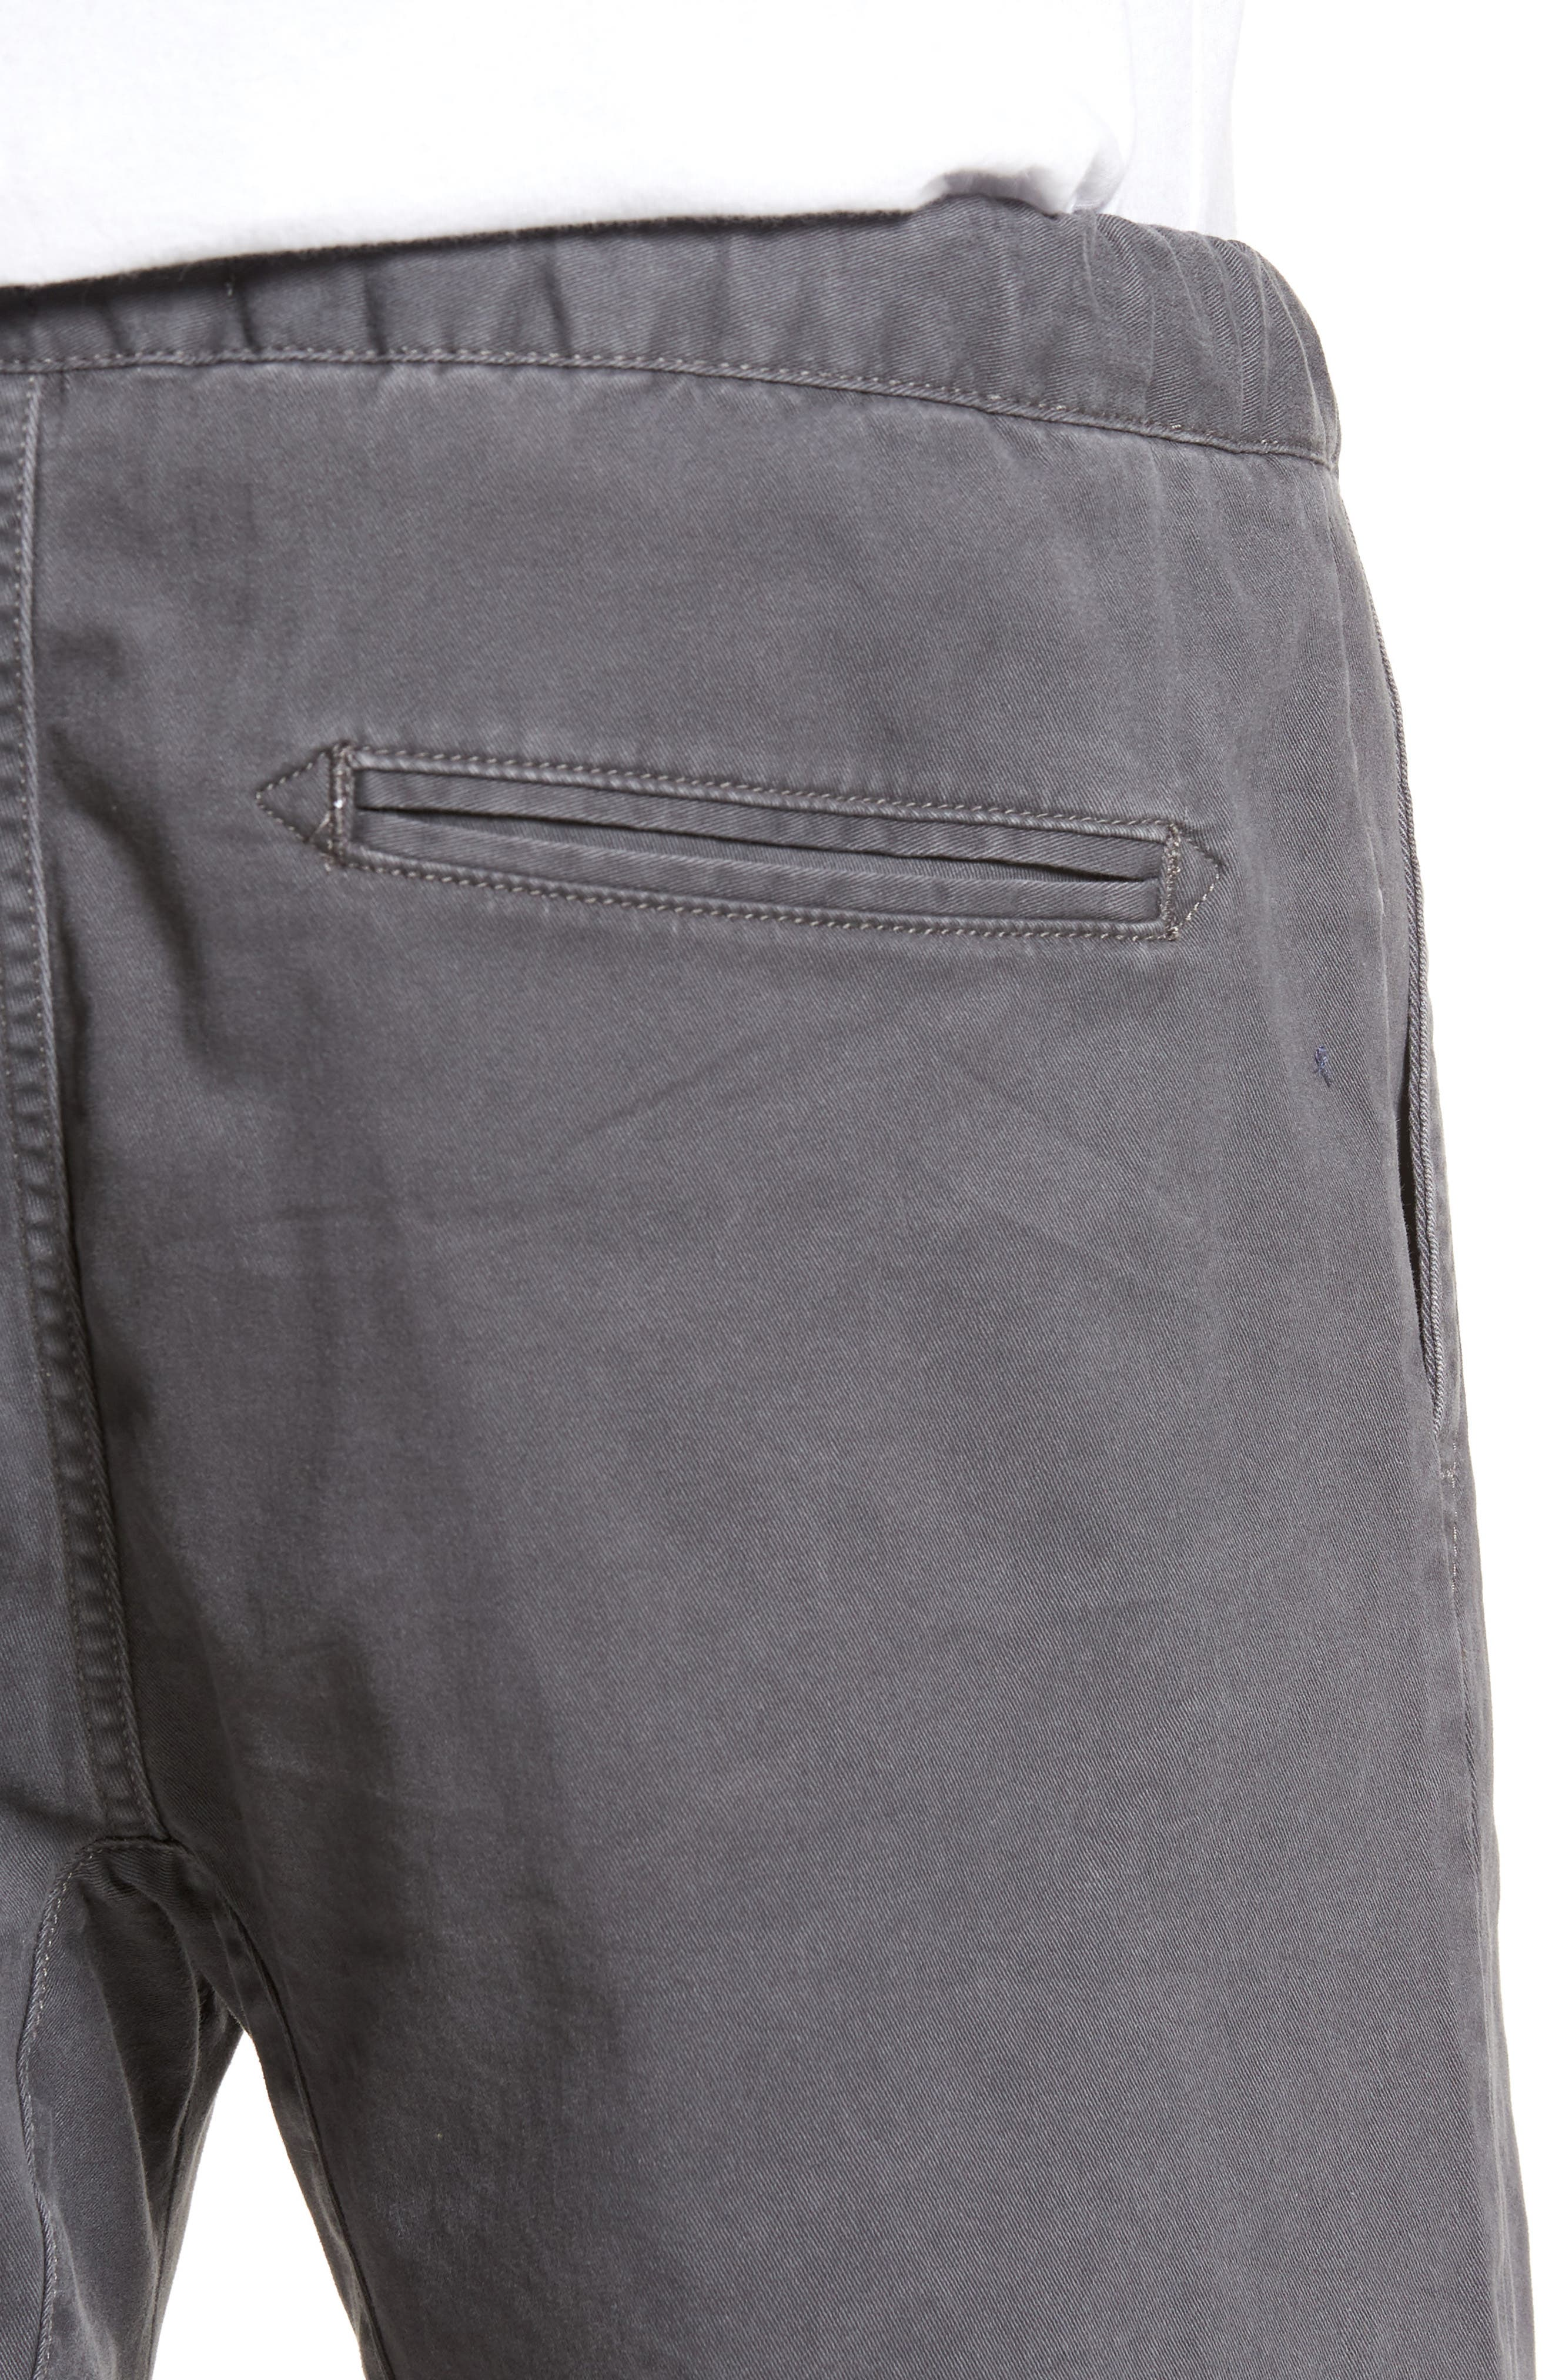 Jogger Shorts,                             Alternate thumbnail 4, color,                             GREY ONYX